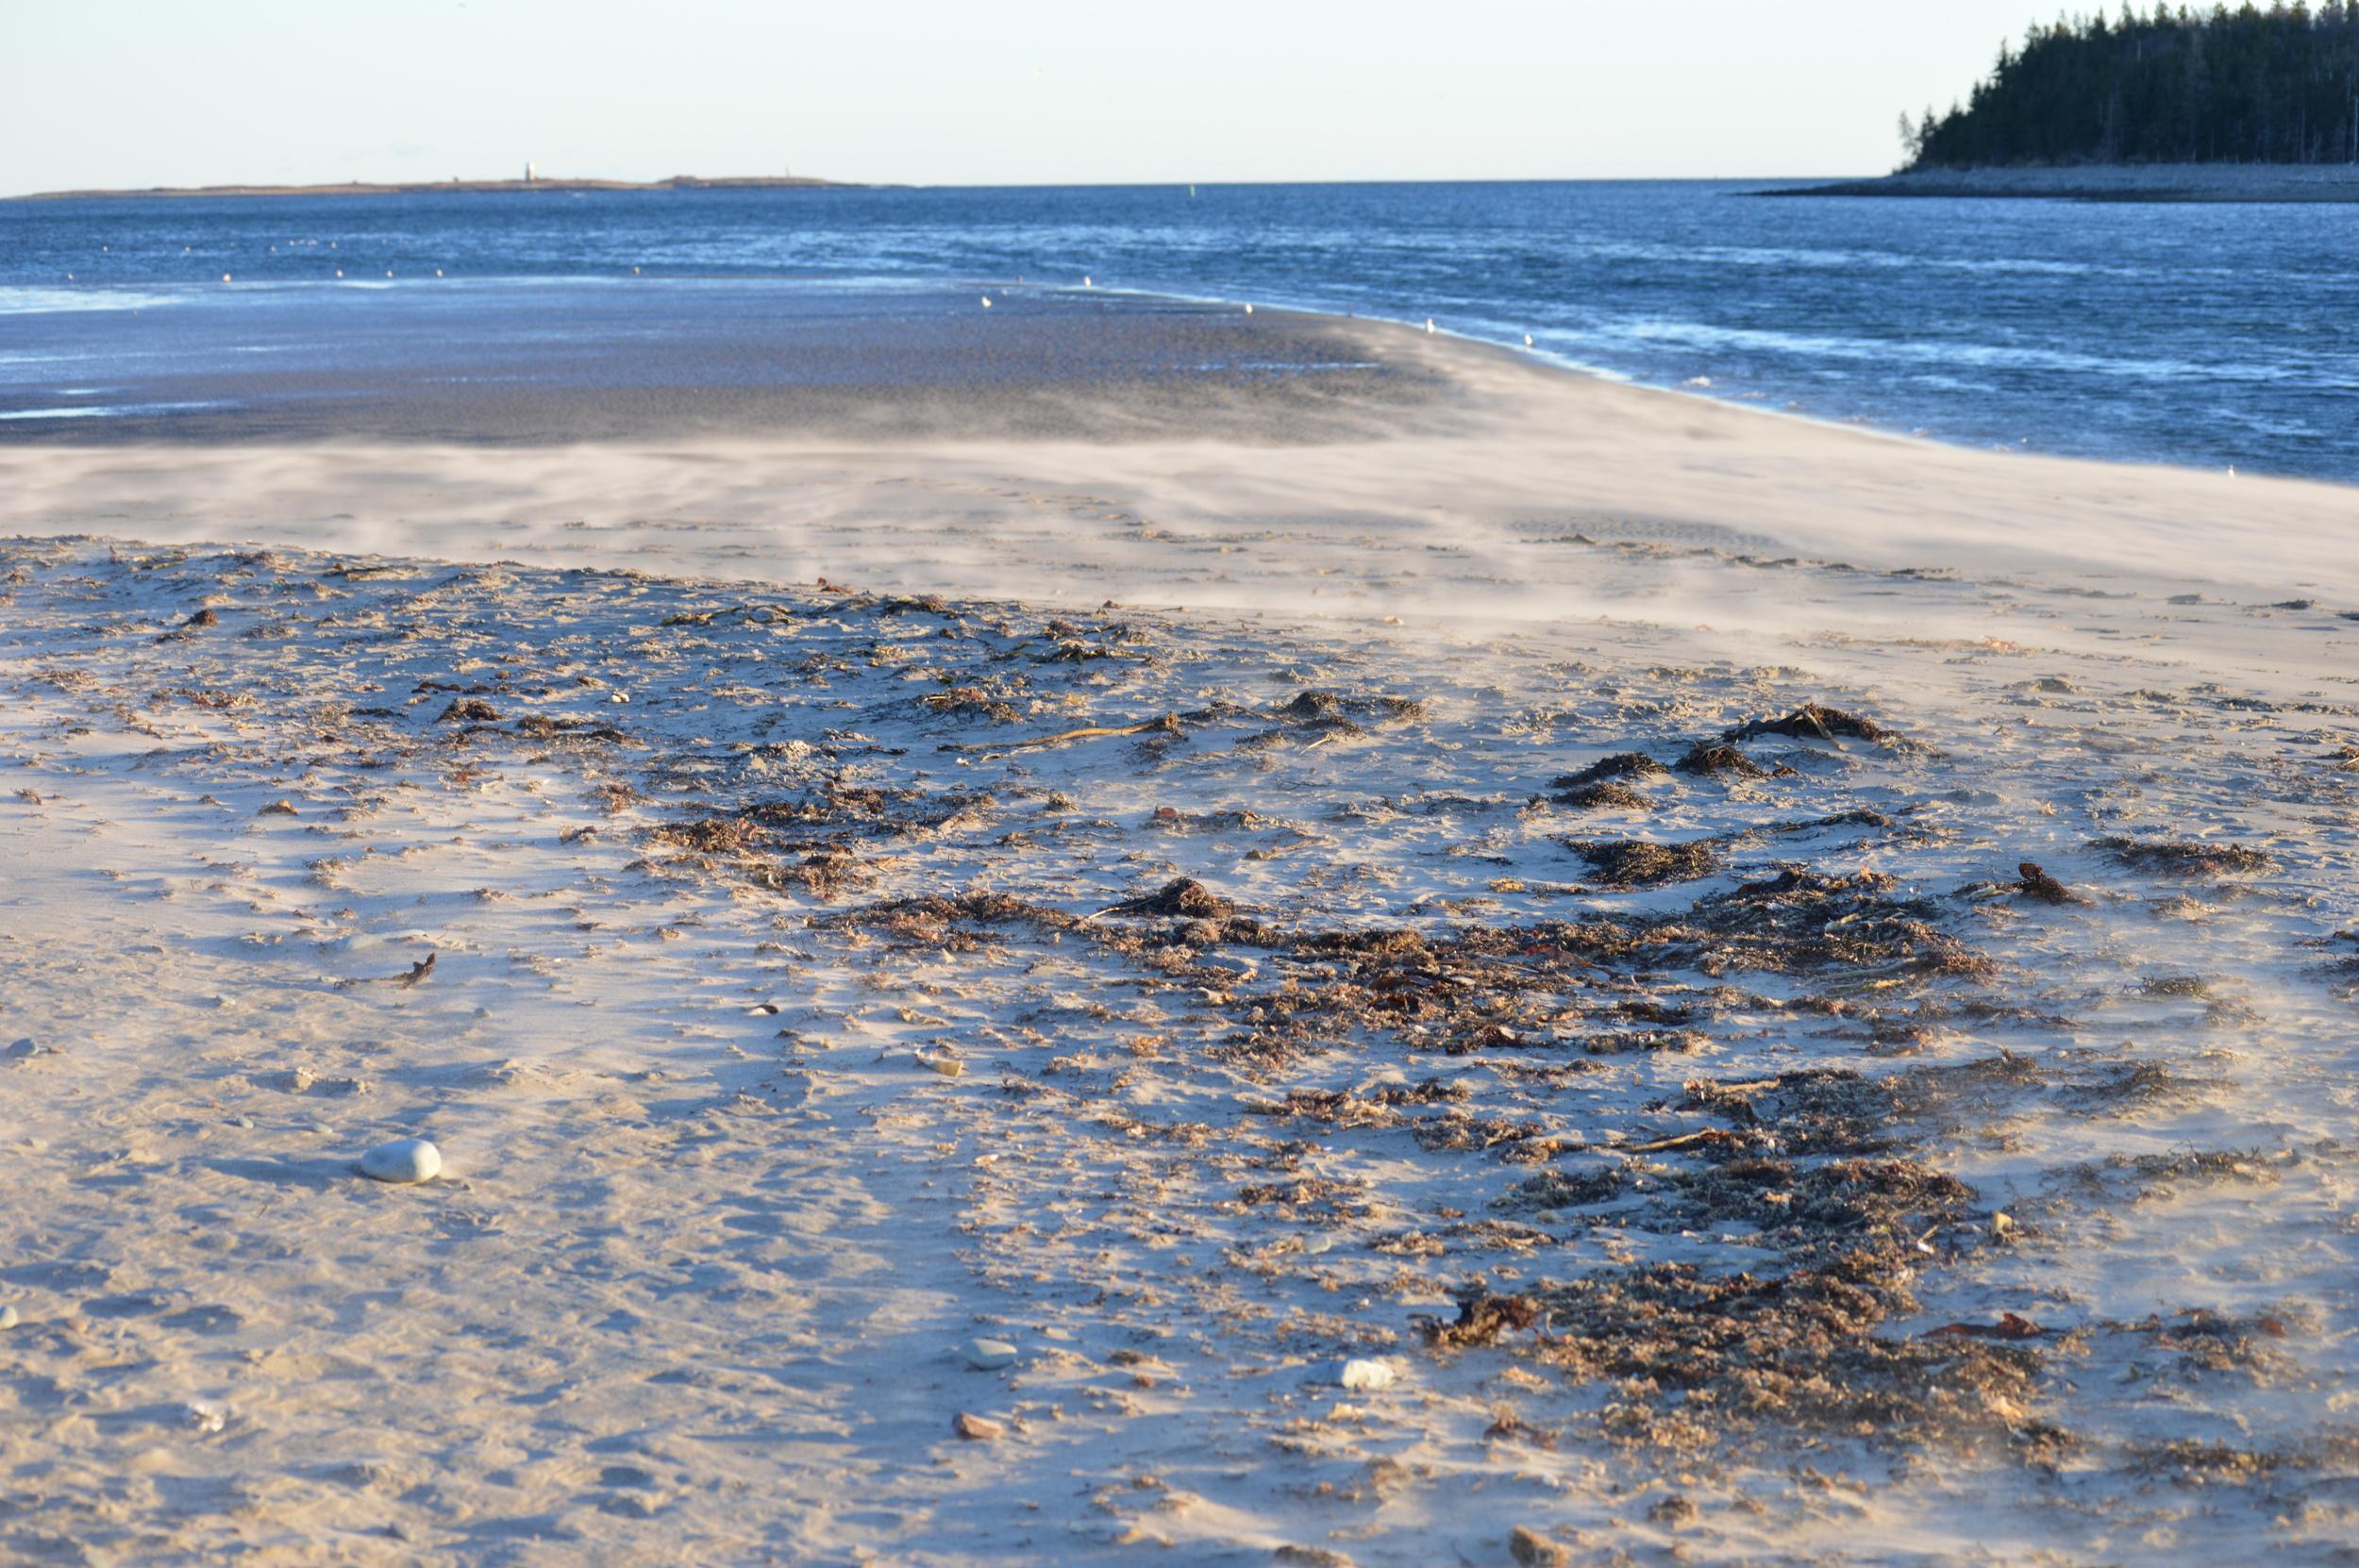 Sand Storm at McCormacks Beach Provincial Park